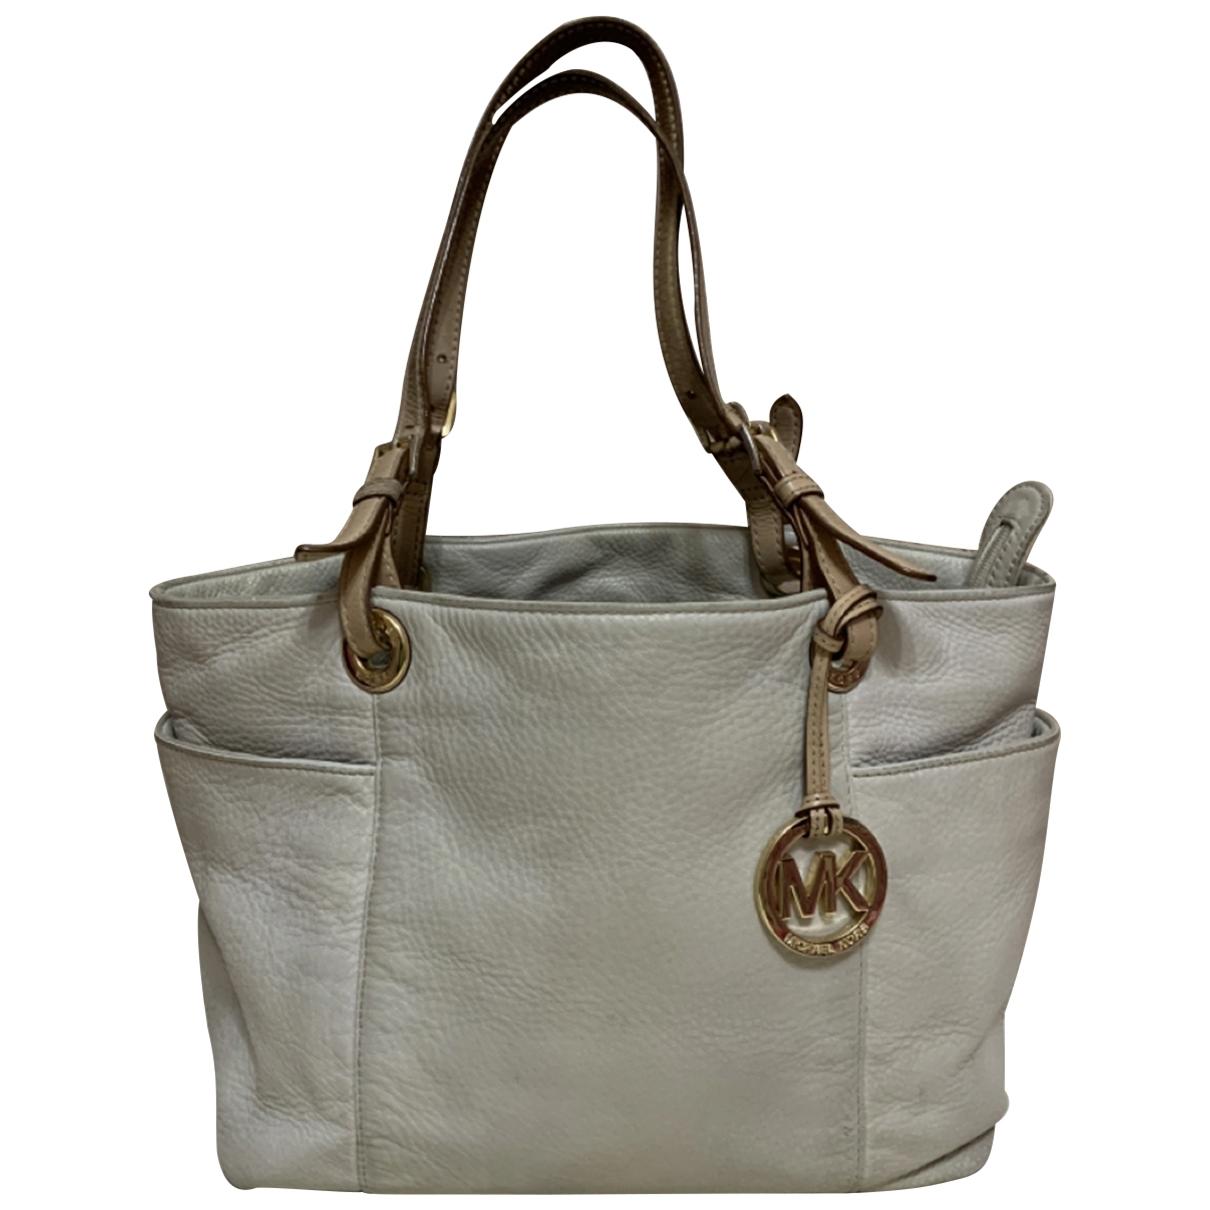 Michael Kors \N Grey Leather handbag for Women \N